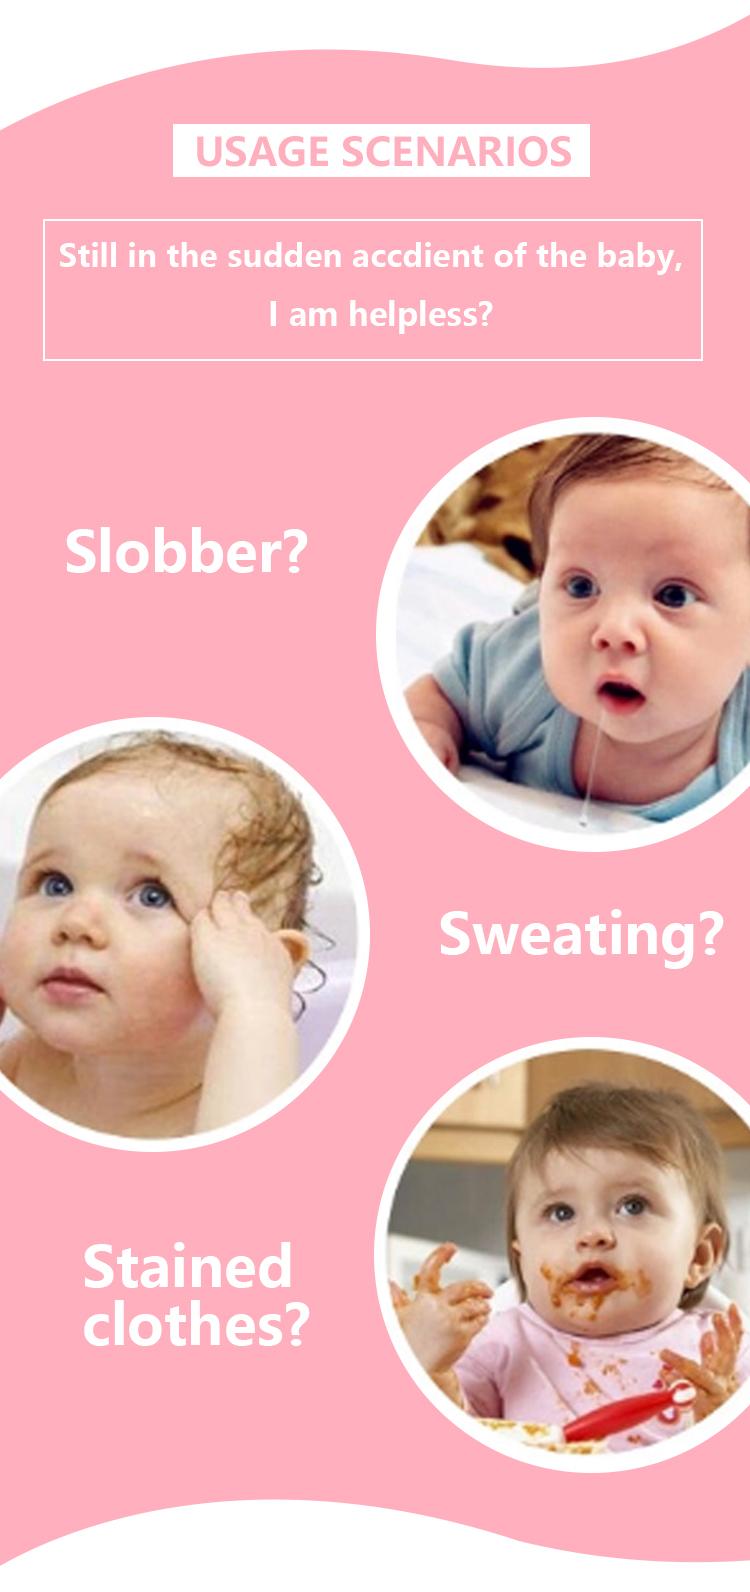 Bset selling Cotton teething drool bib,Reusable Washable Baby Bandana Drool Bibs for Drooling and Teething